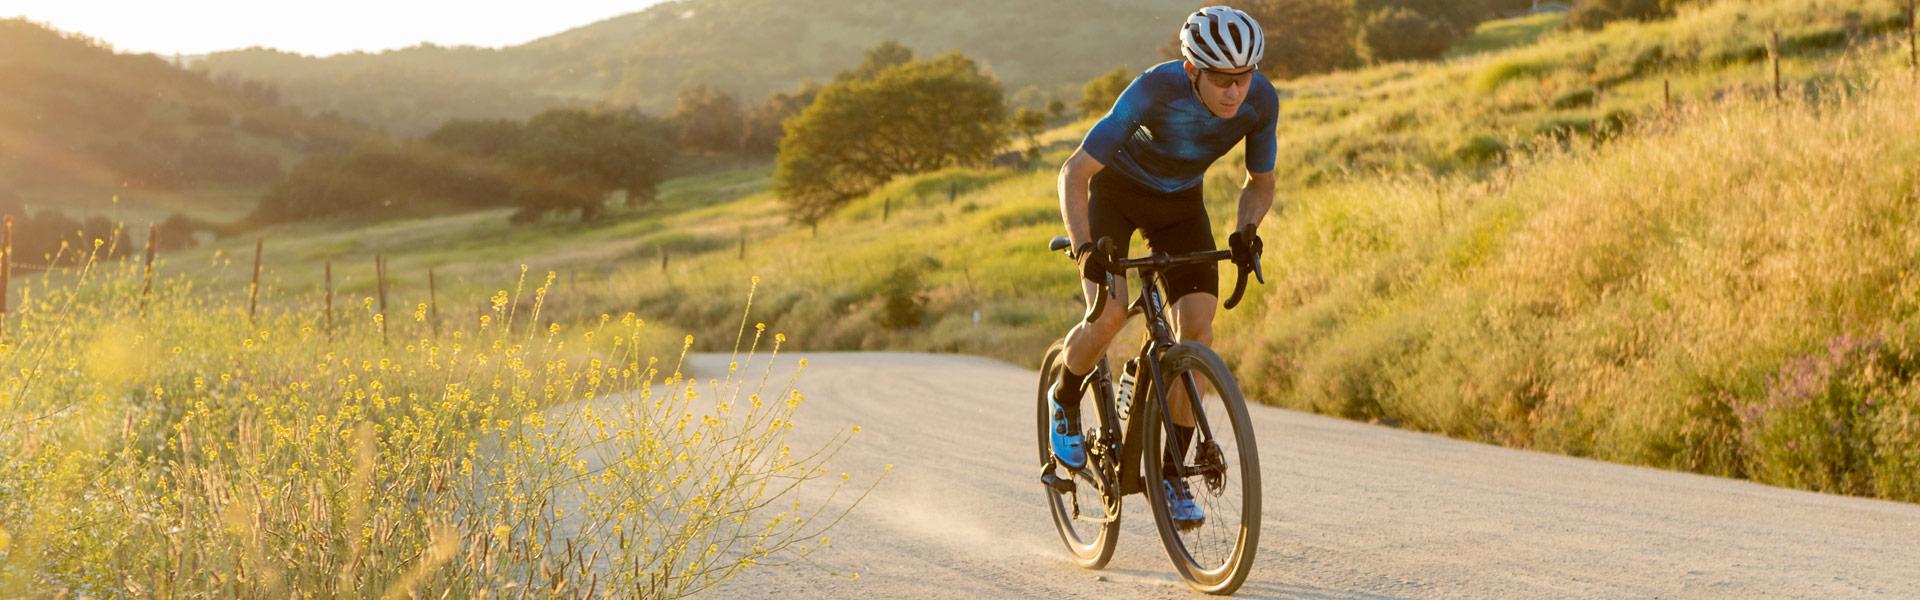 Cyclocrosser & Gravel Bikes